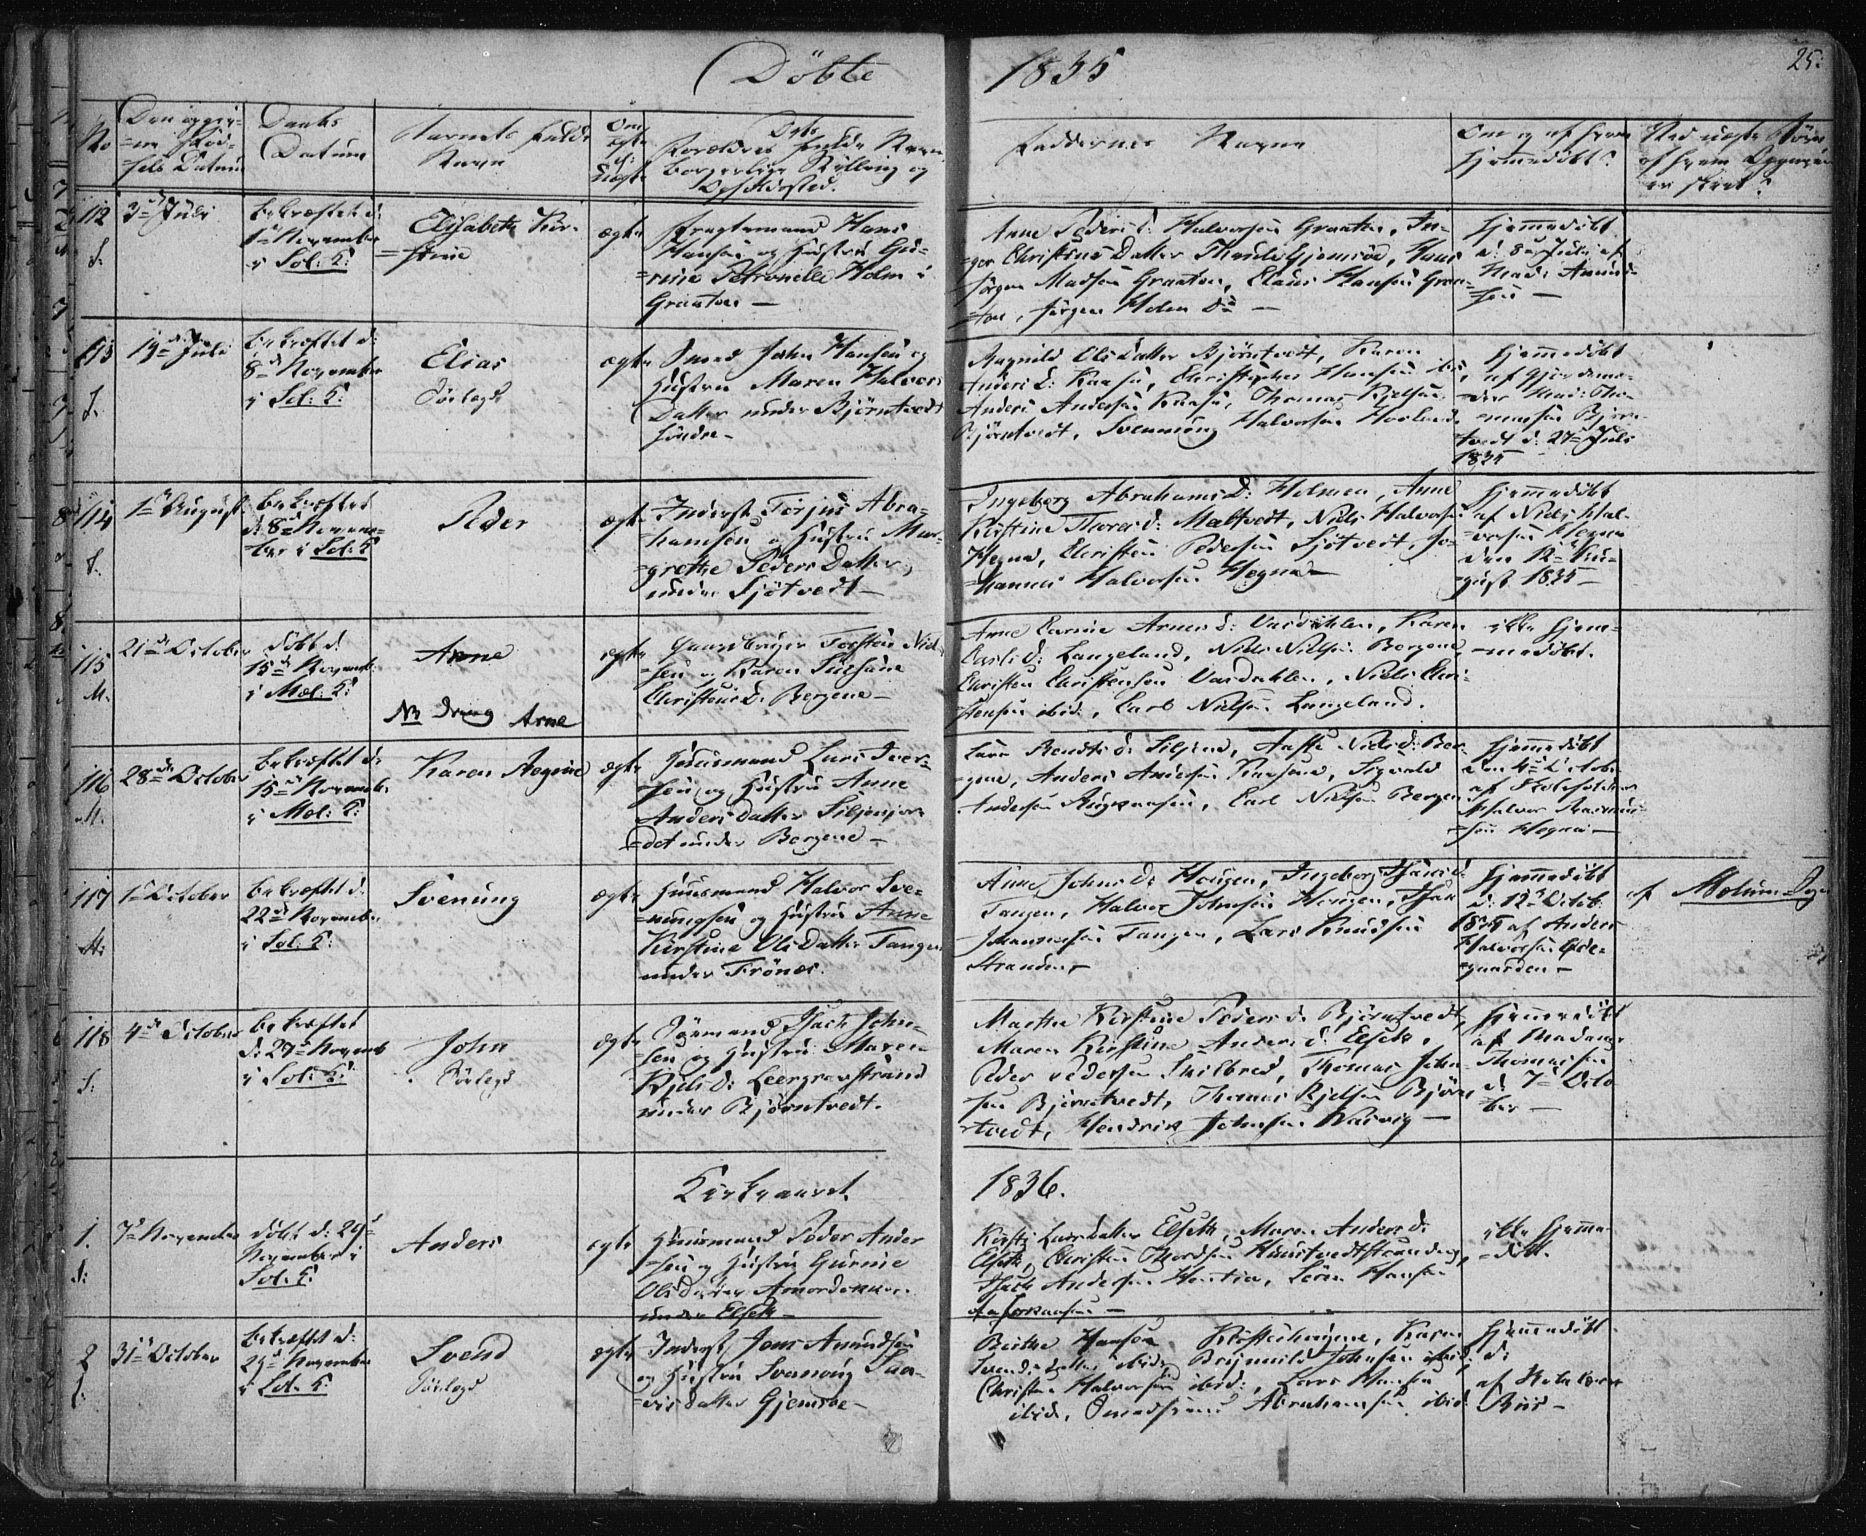 SAKO, Solum kirkebøker, F/Fa/L0005: Ministerialbok nr. I 5, 1833-1843, s. 25